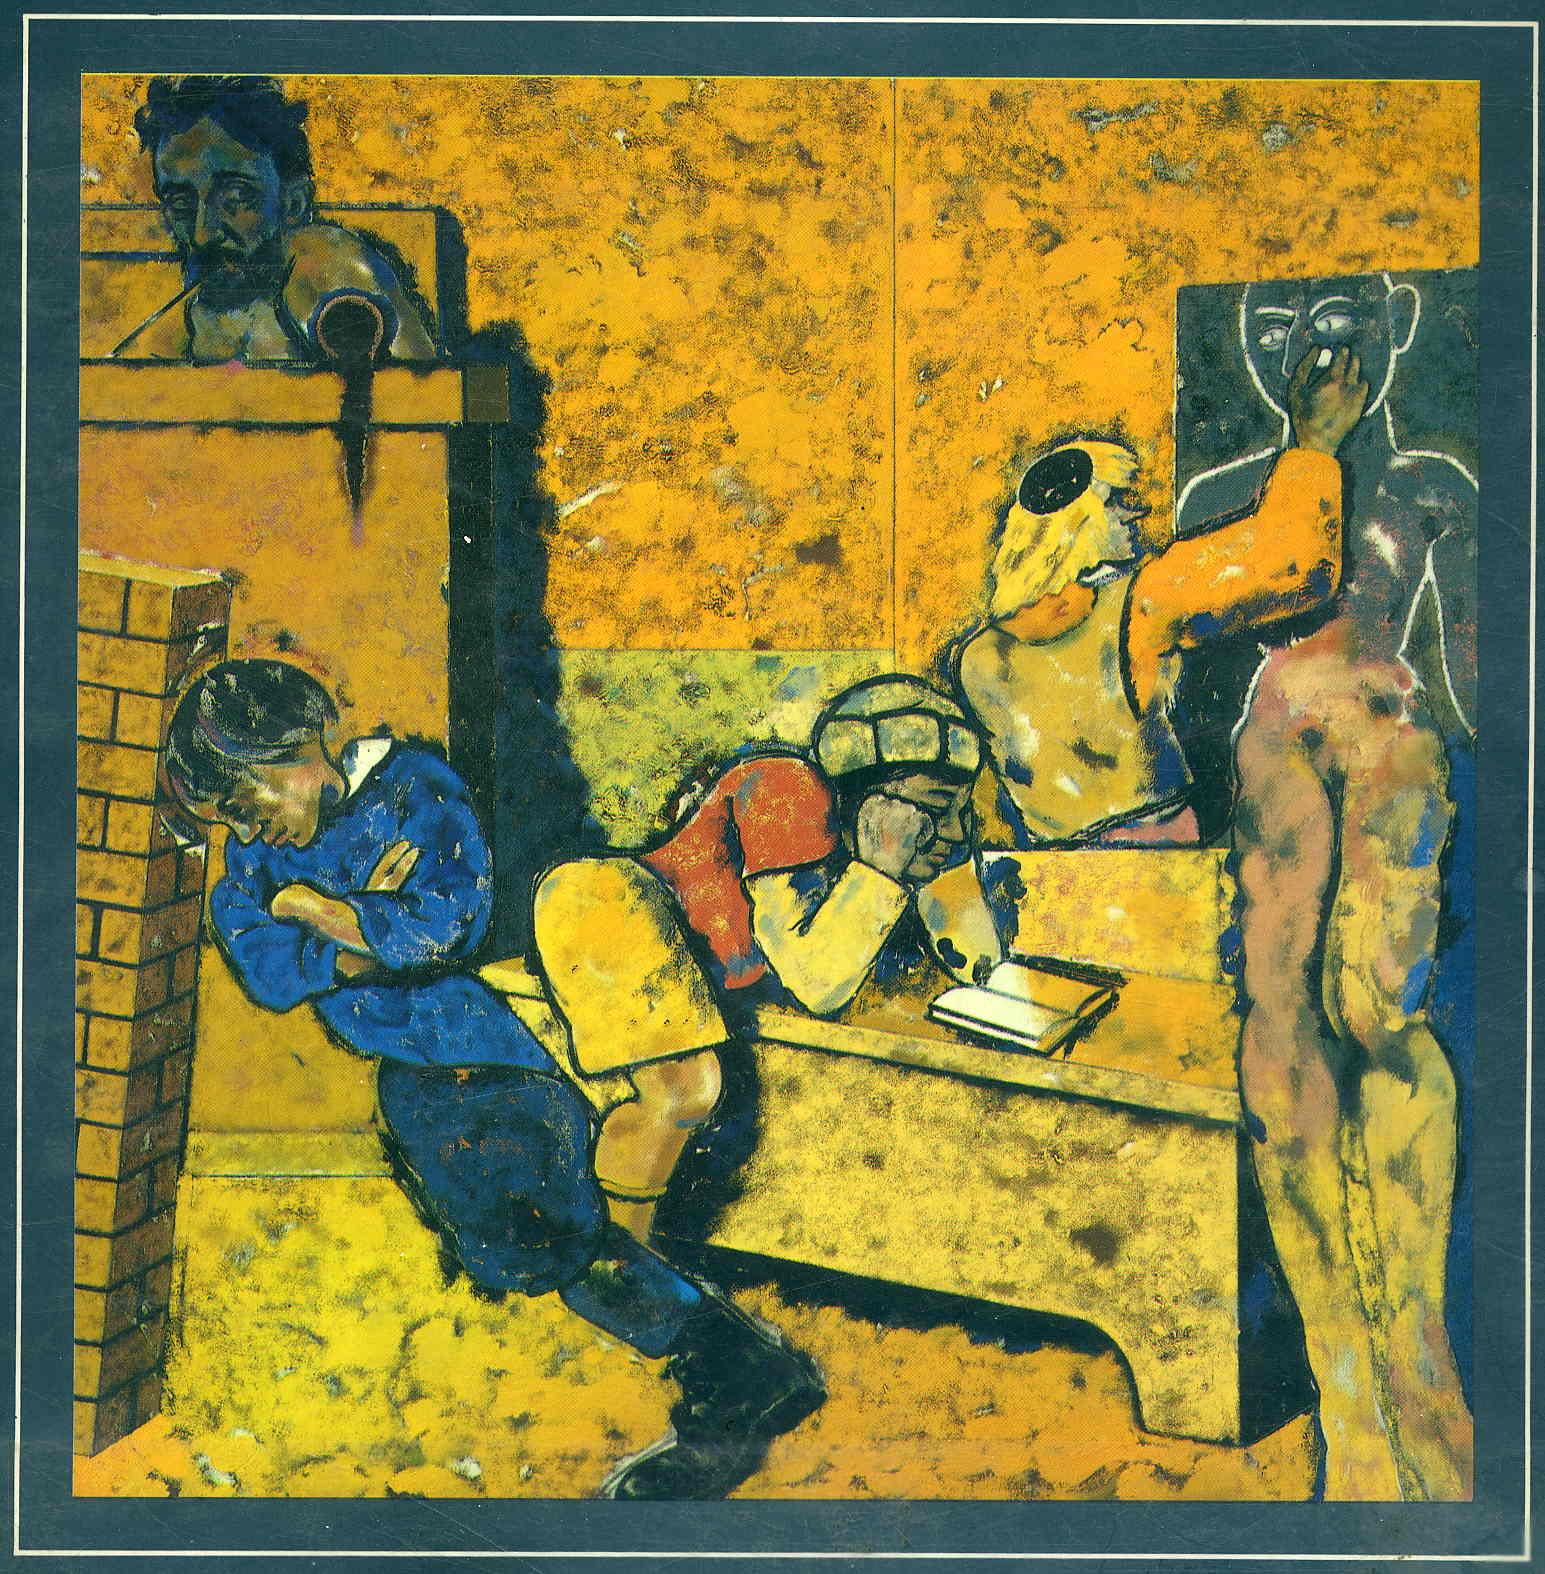 Ronald Brooks Kitaj Artwork for Sale at Online Auction